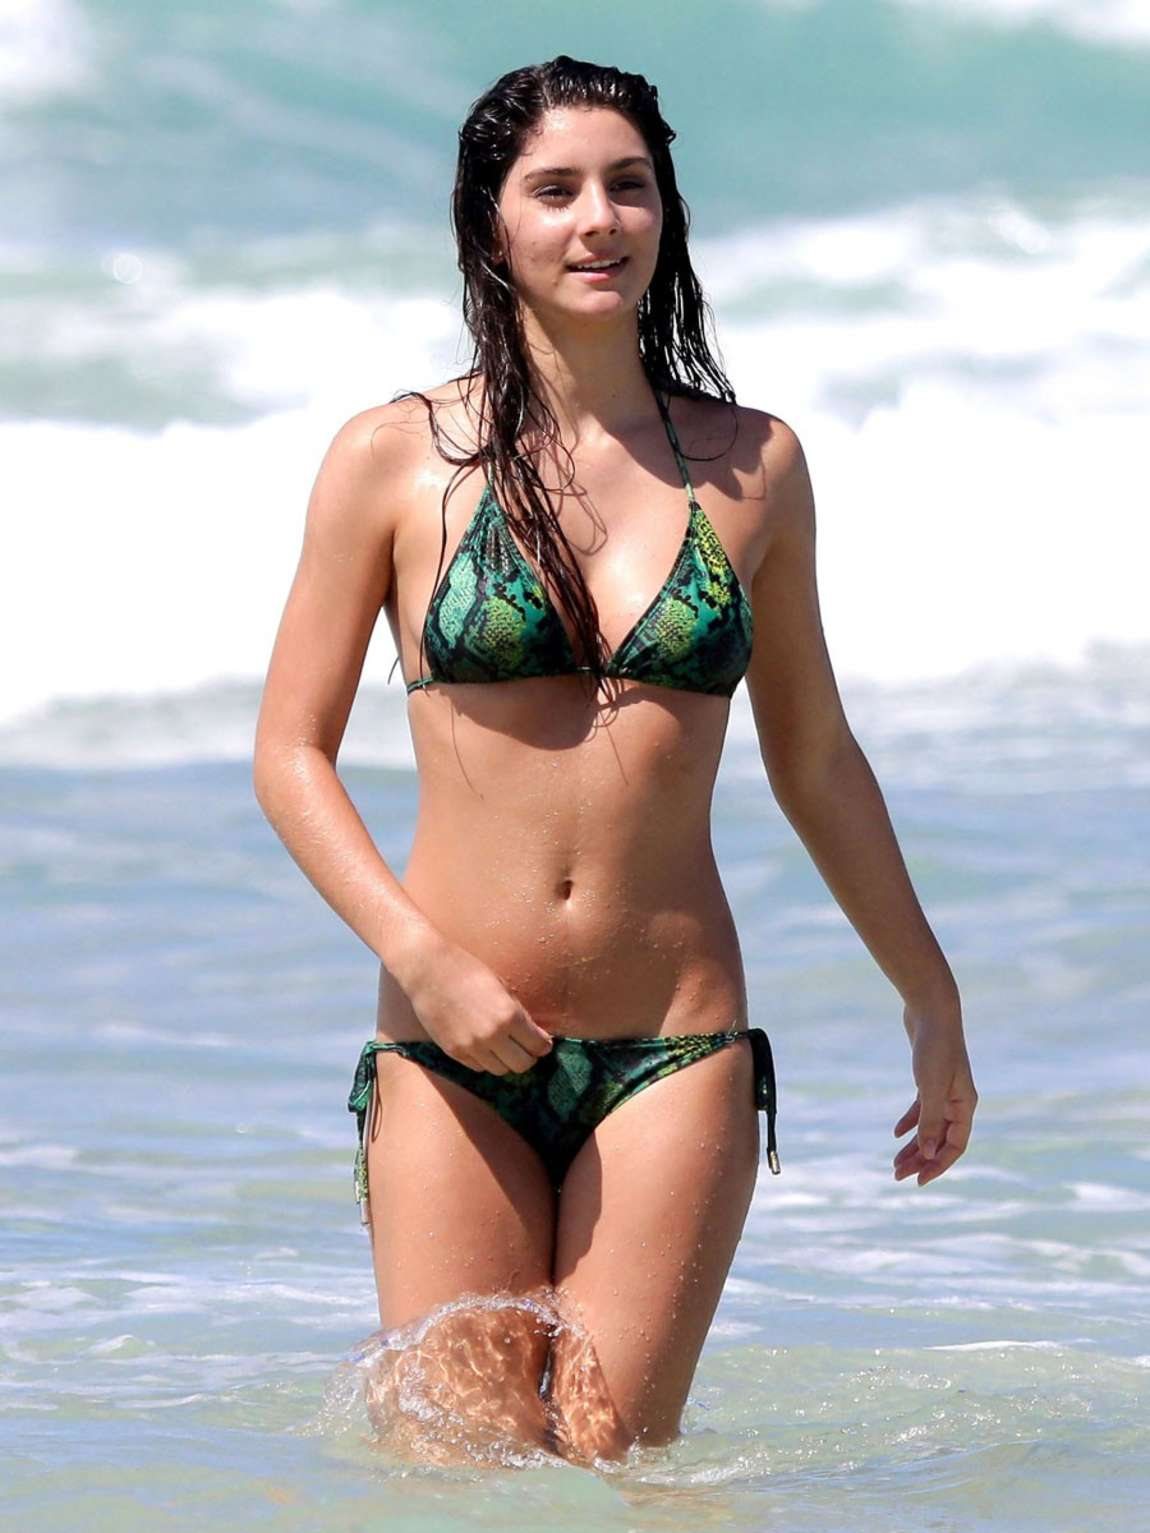 Josephine Georgia In Bikini At Gold Coast In Australia